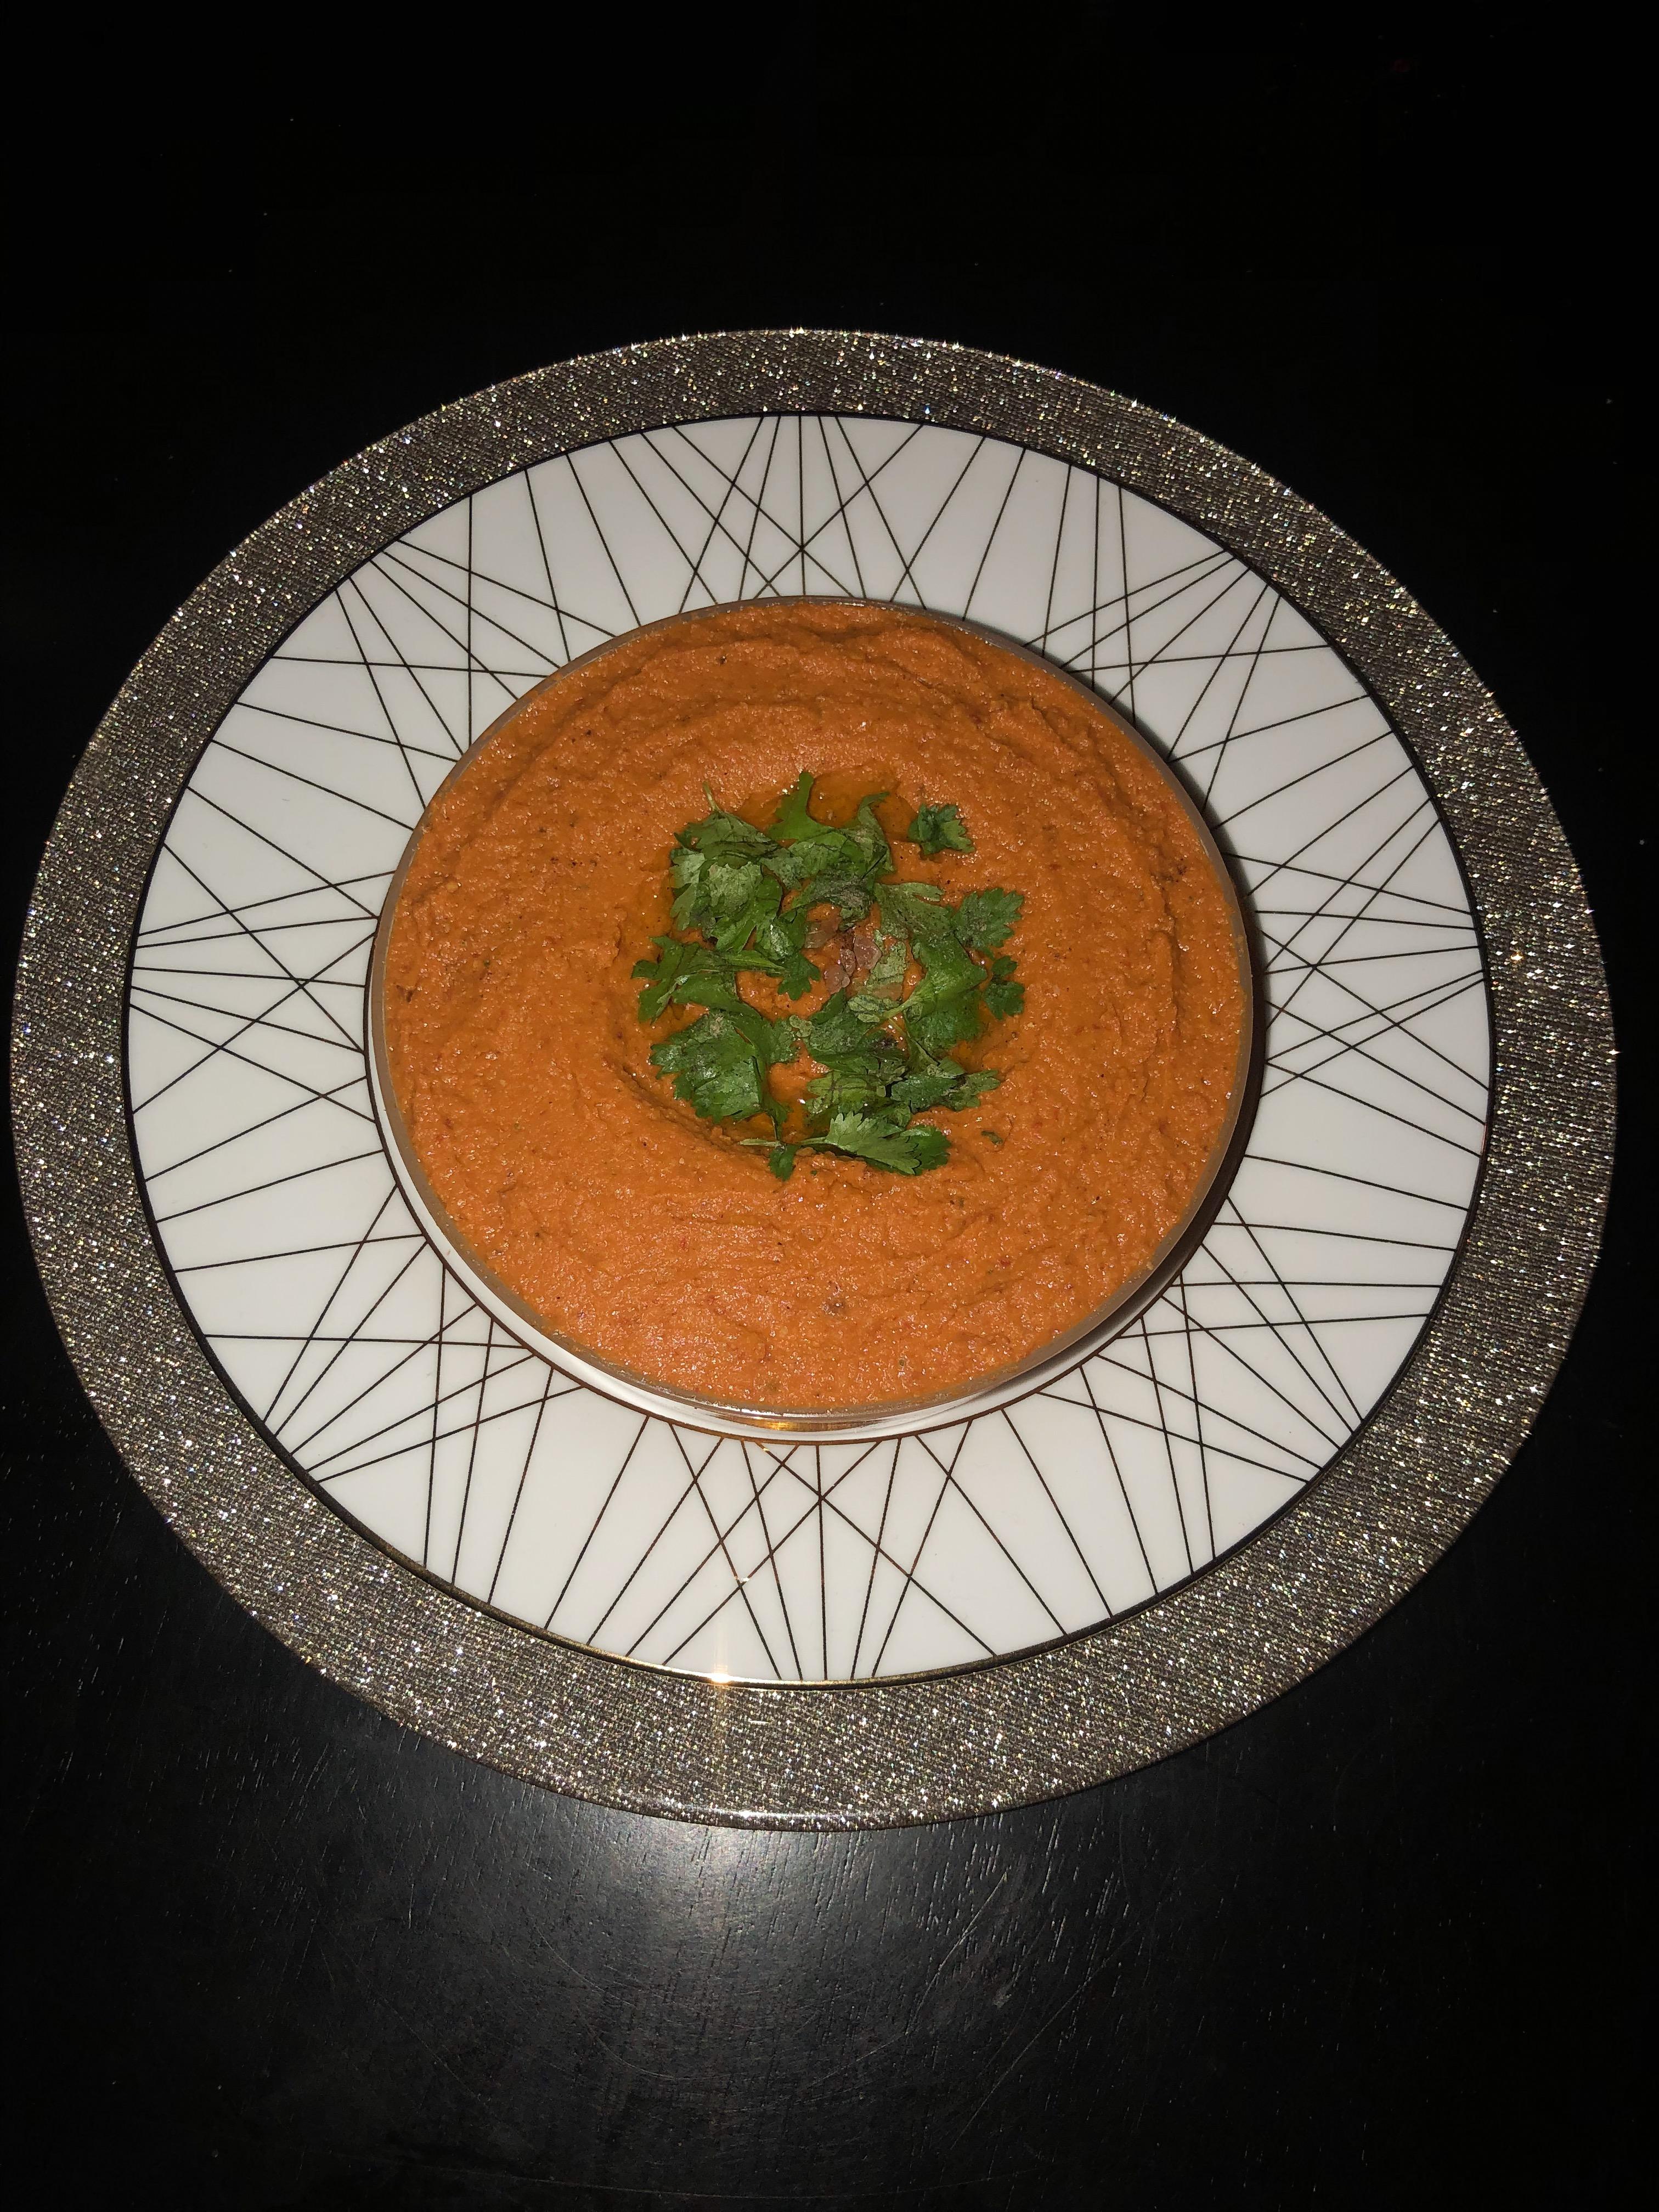 Smoky Chipotle Hummus ariana